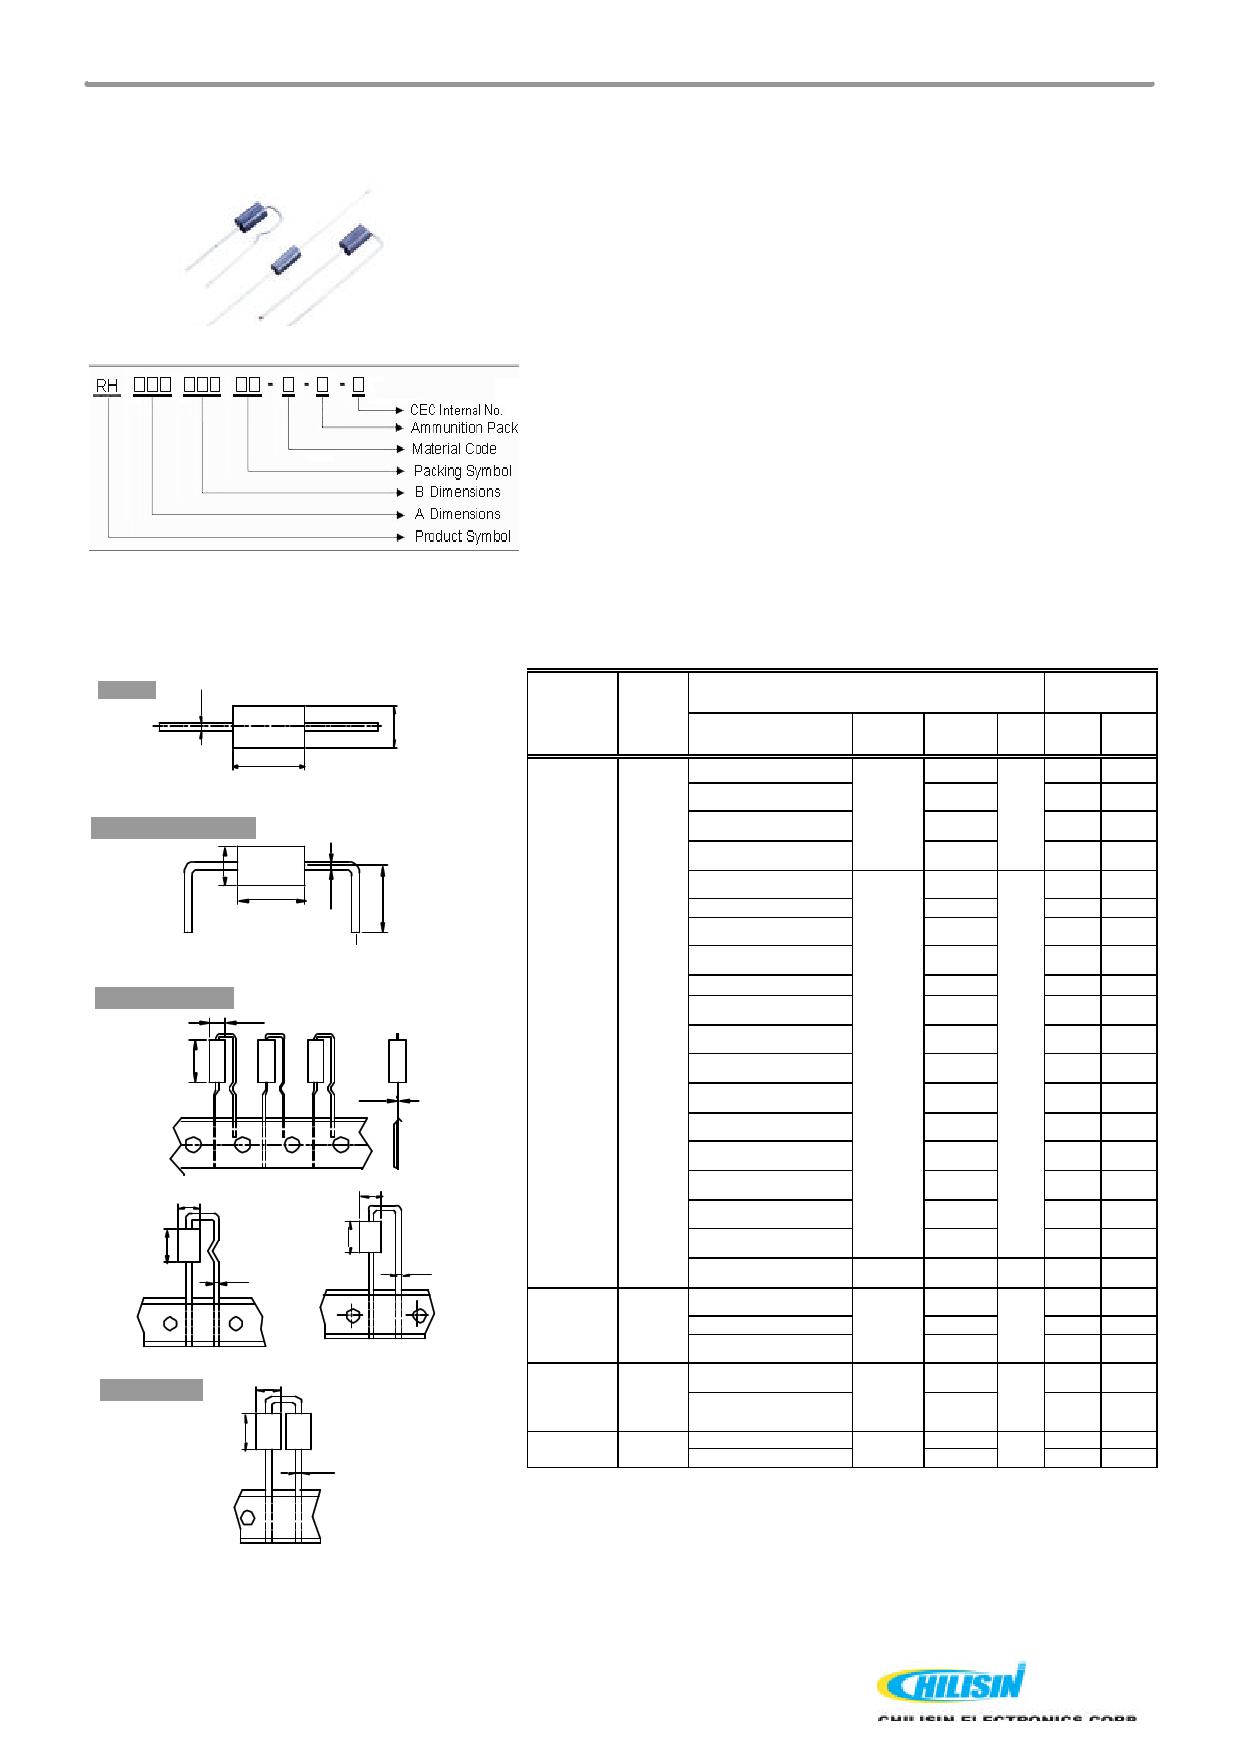 RH03514 데이터시트 및 RH03514 PDF